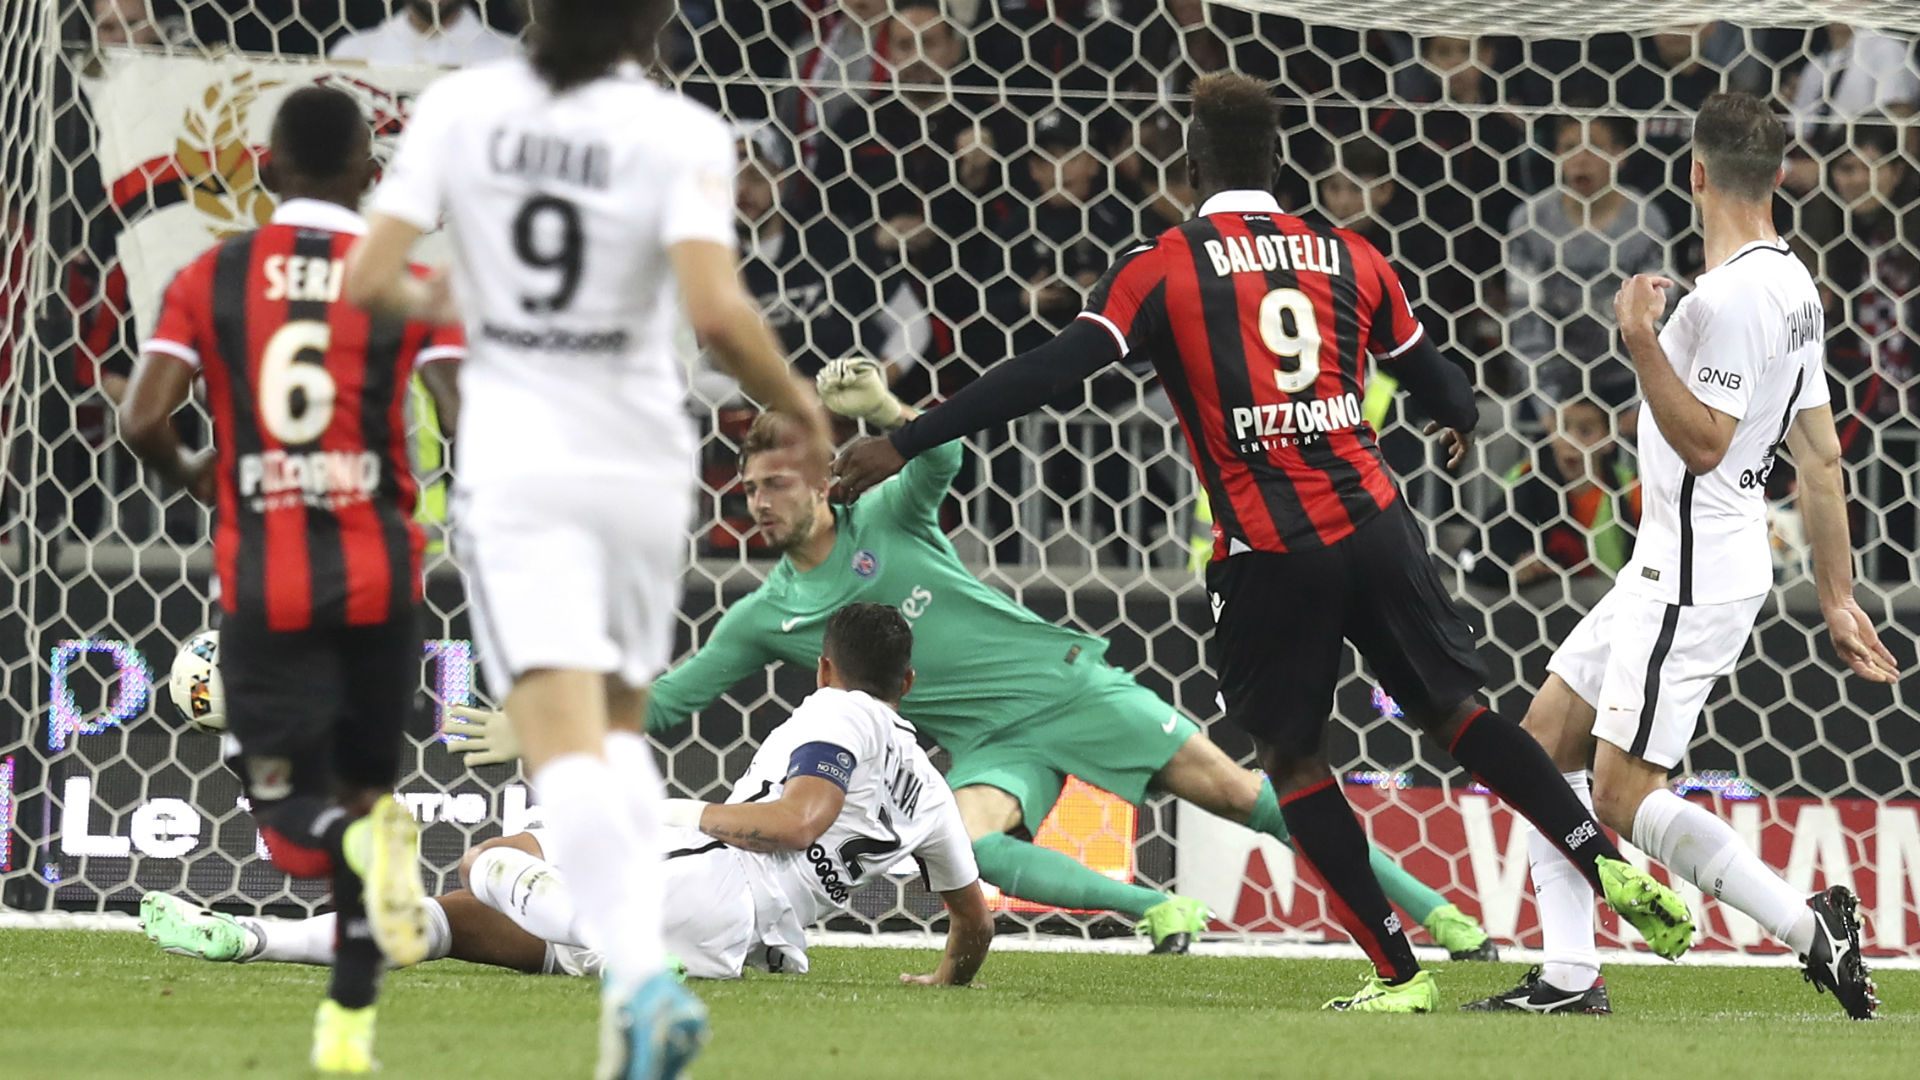 Francia: Nizza batte PSG 3-1